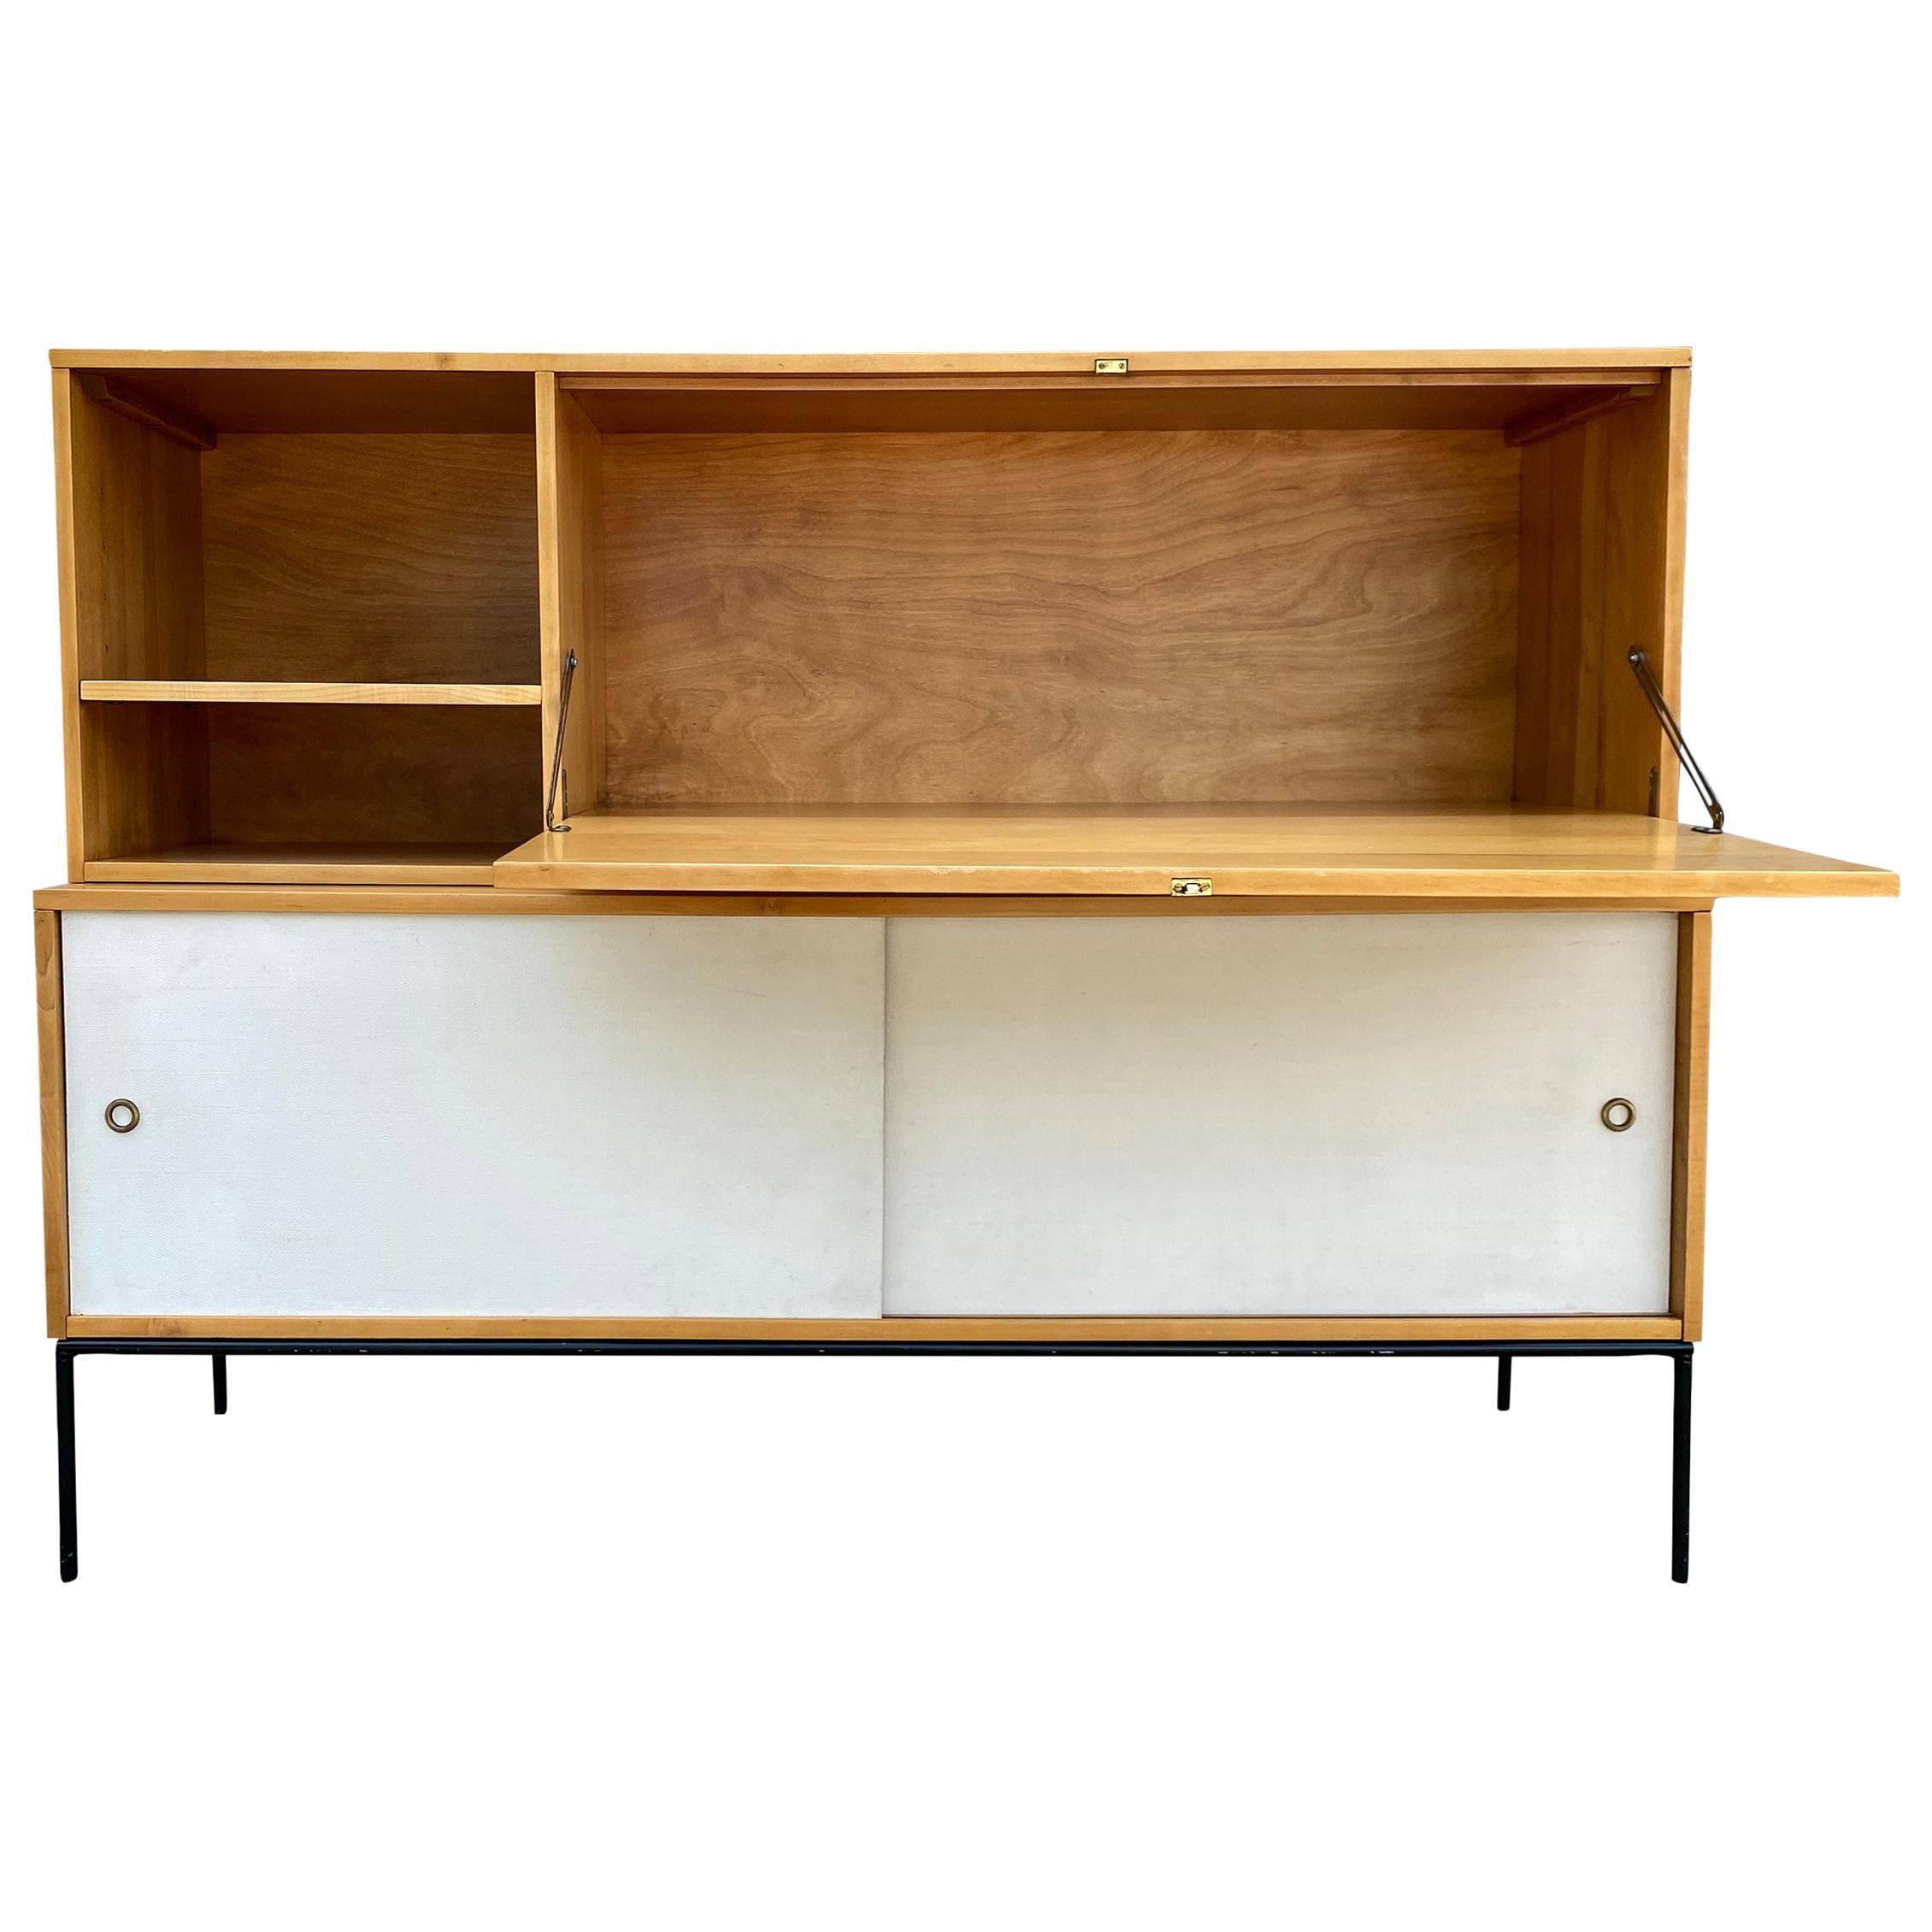 Rare Midcentury Paul McCobb #1562 Drop Lid Desk on Low Credenza Maple White